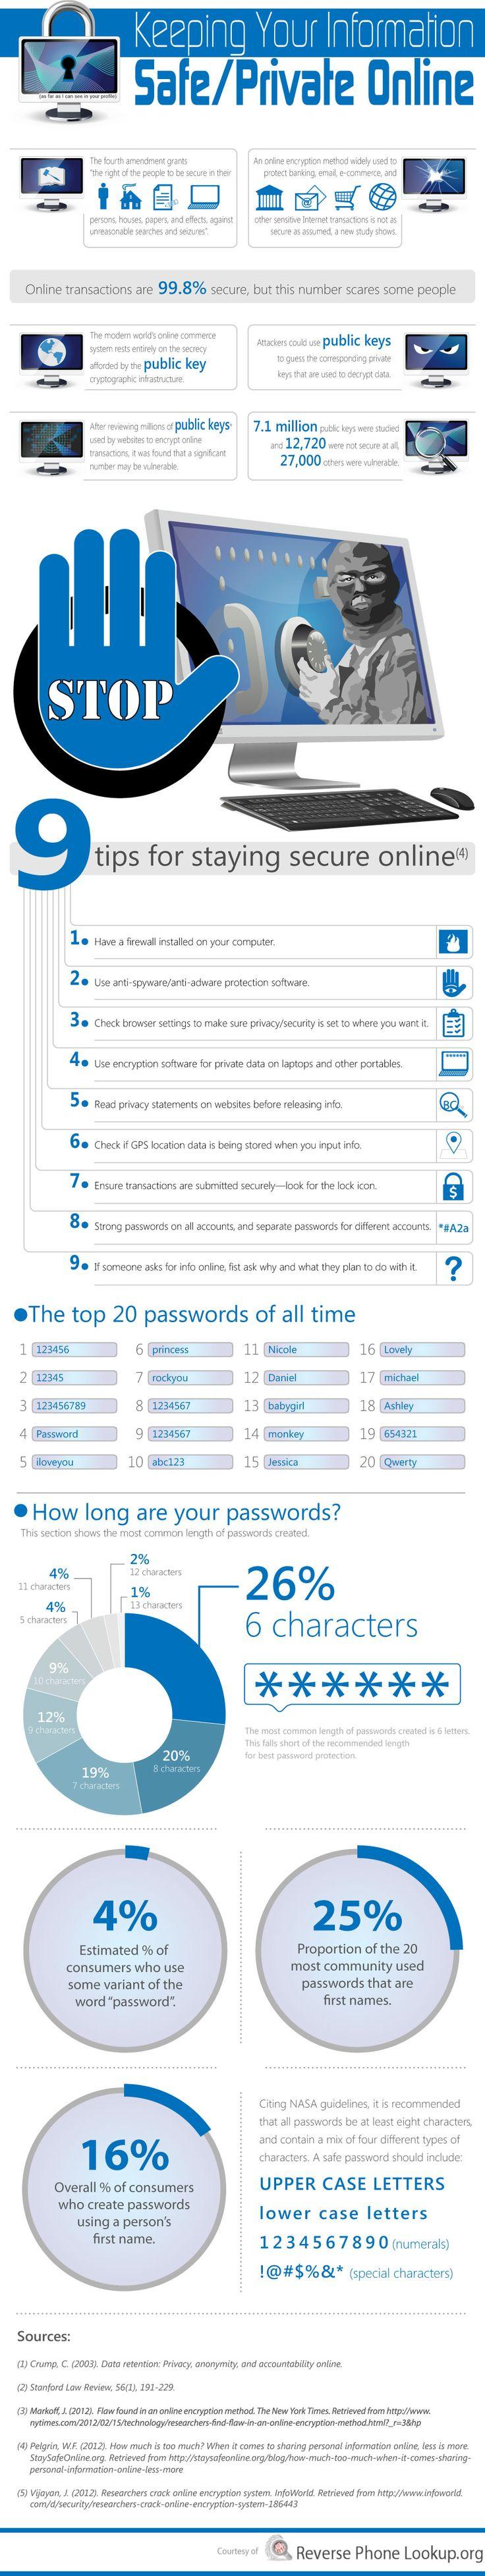 Consejos para tu seguridad online #infograftia #infographic #internet @alfredovela